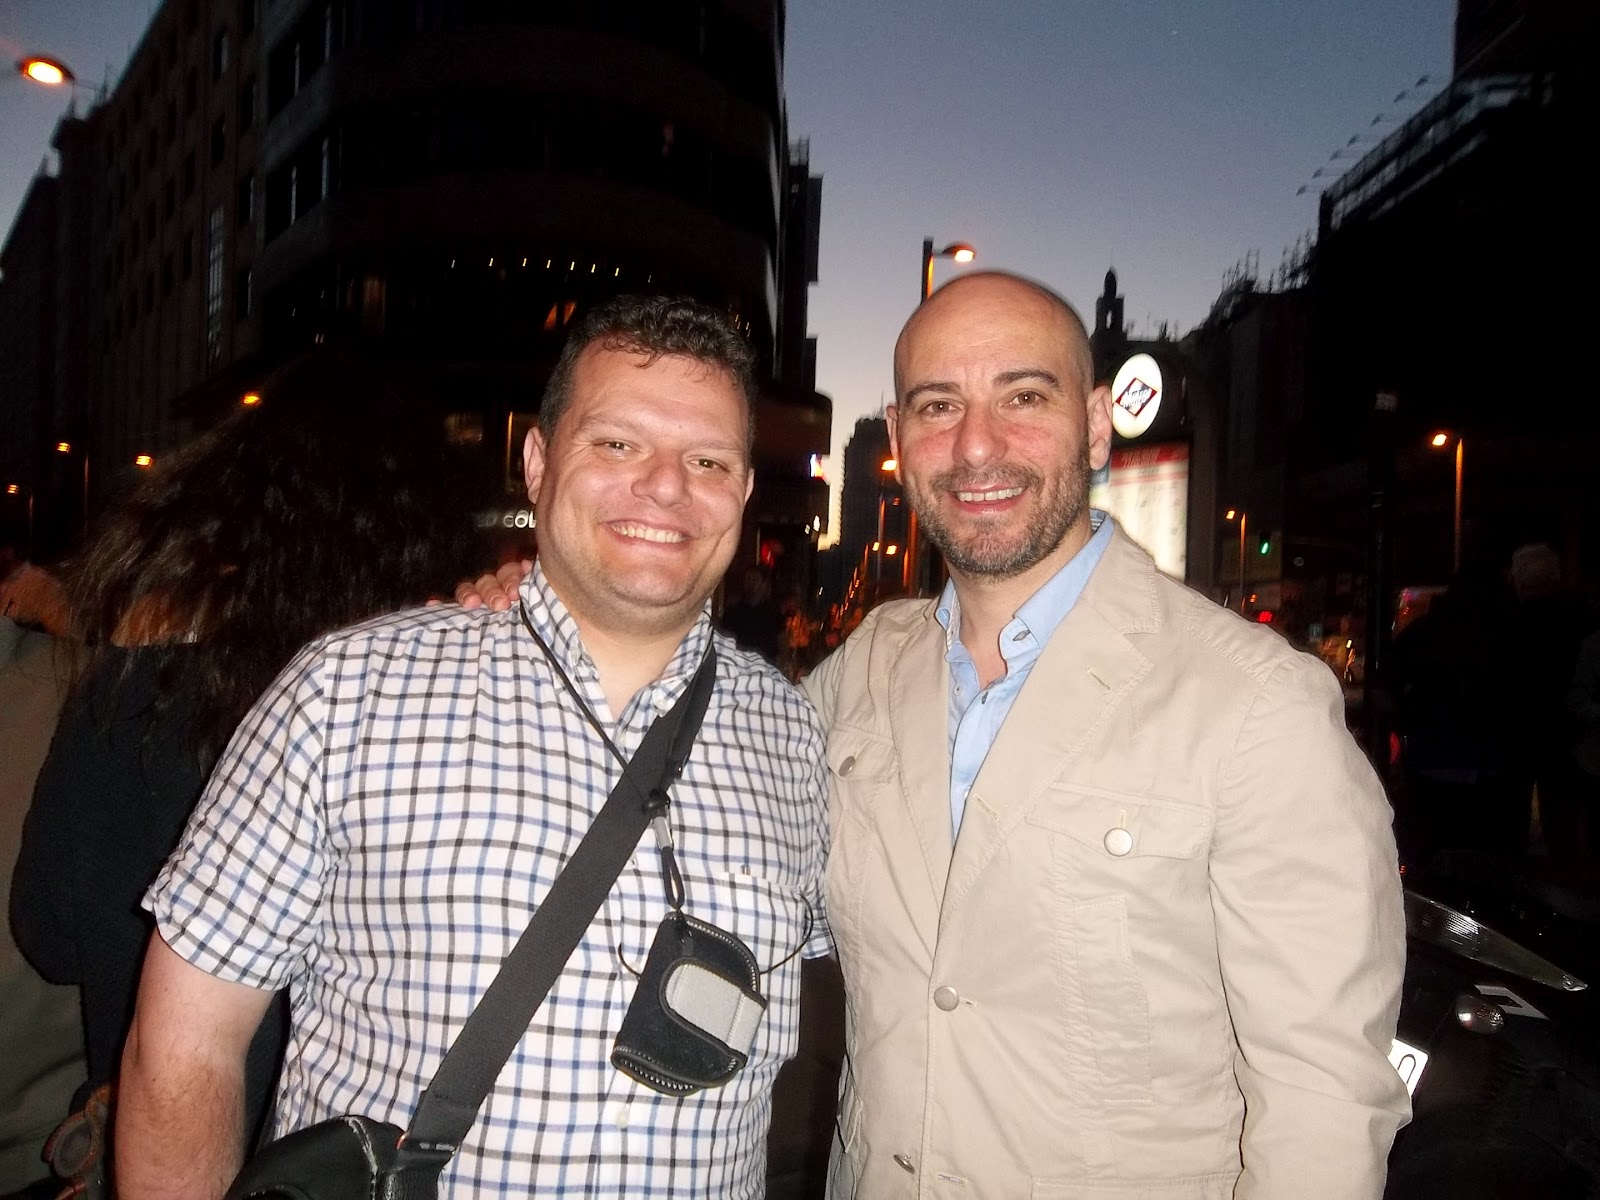 ¿Cuánto mide Jaime Ordóñez? (Actor) - Altura BERNI+Y+JAIME+ORDO%C3%91EZ